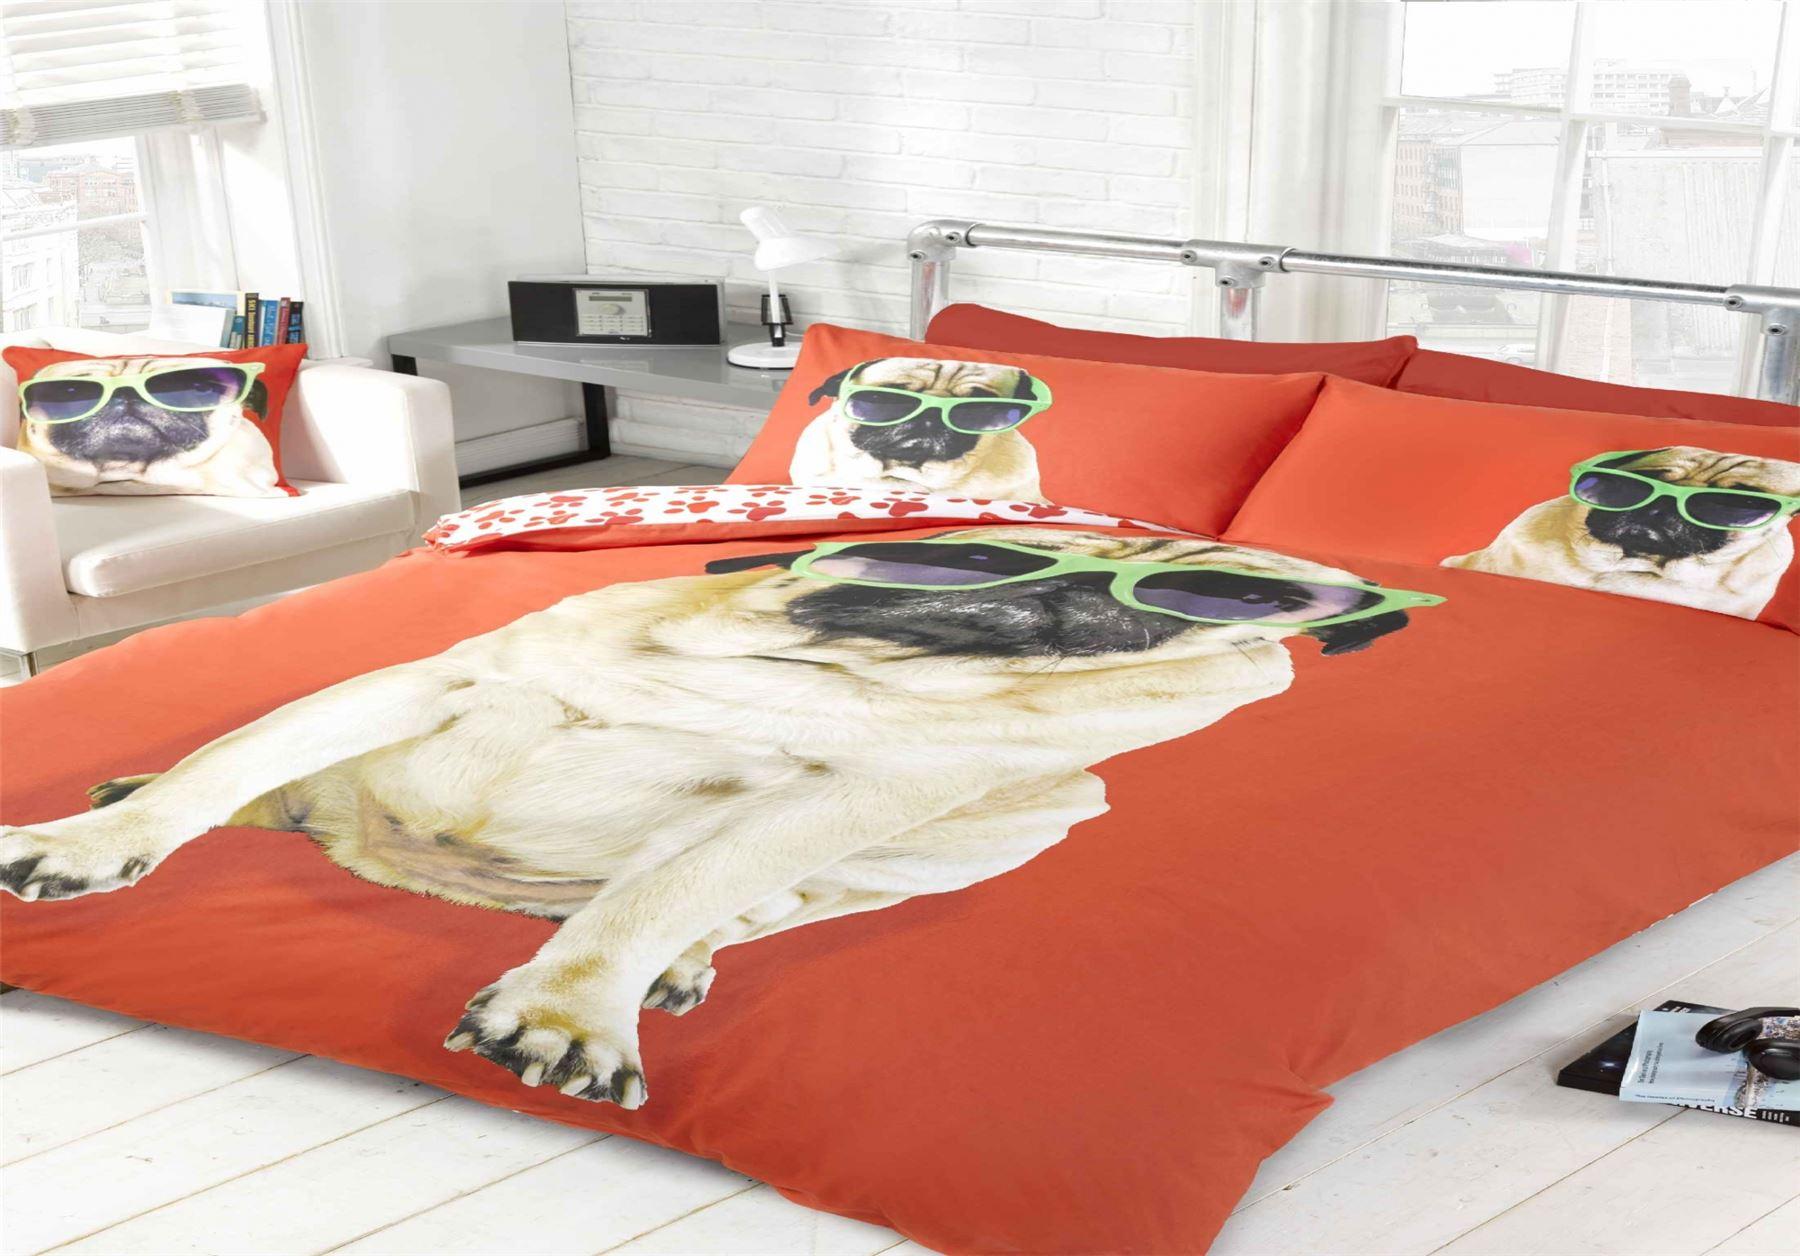 Pug Dog Puppy Cute Quilt Duvet Cover Bedding Bedset Pillowcase 3 Sizes 5 designs eBay